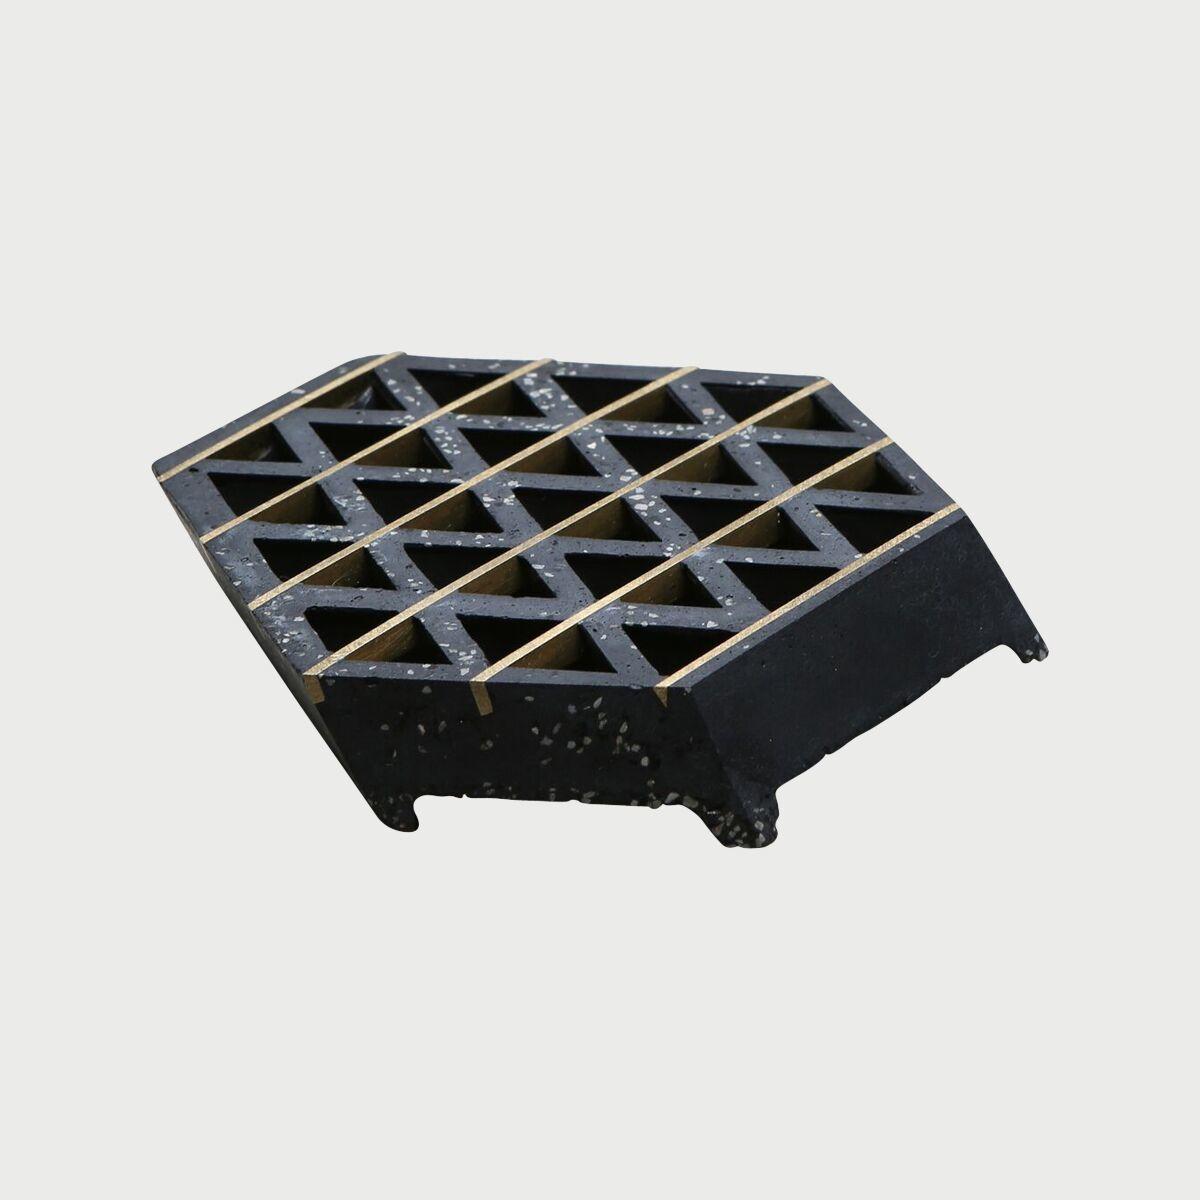 Copy of Tetrahedral Waffle-Slab Soap Dish